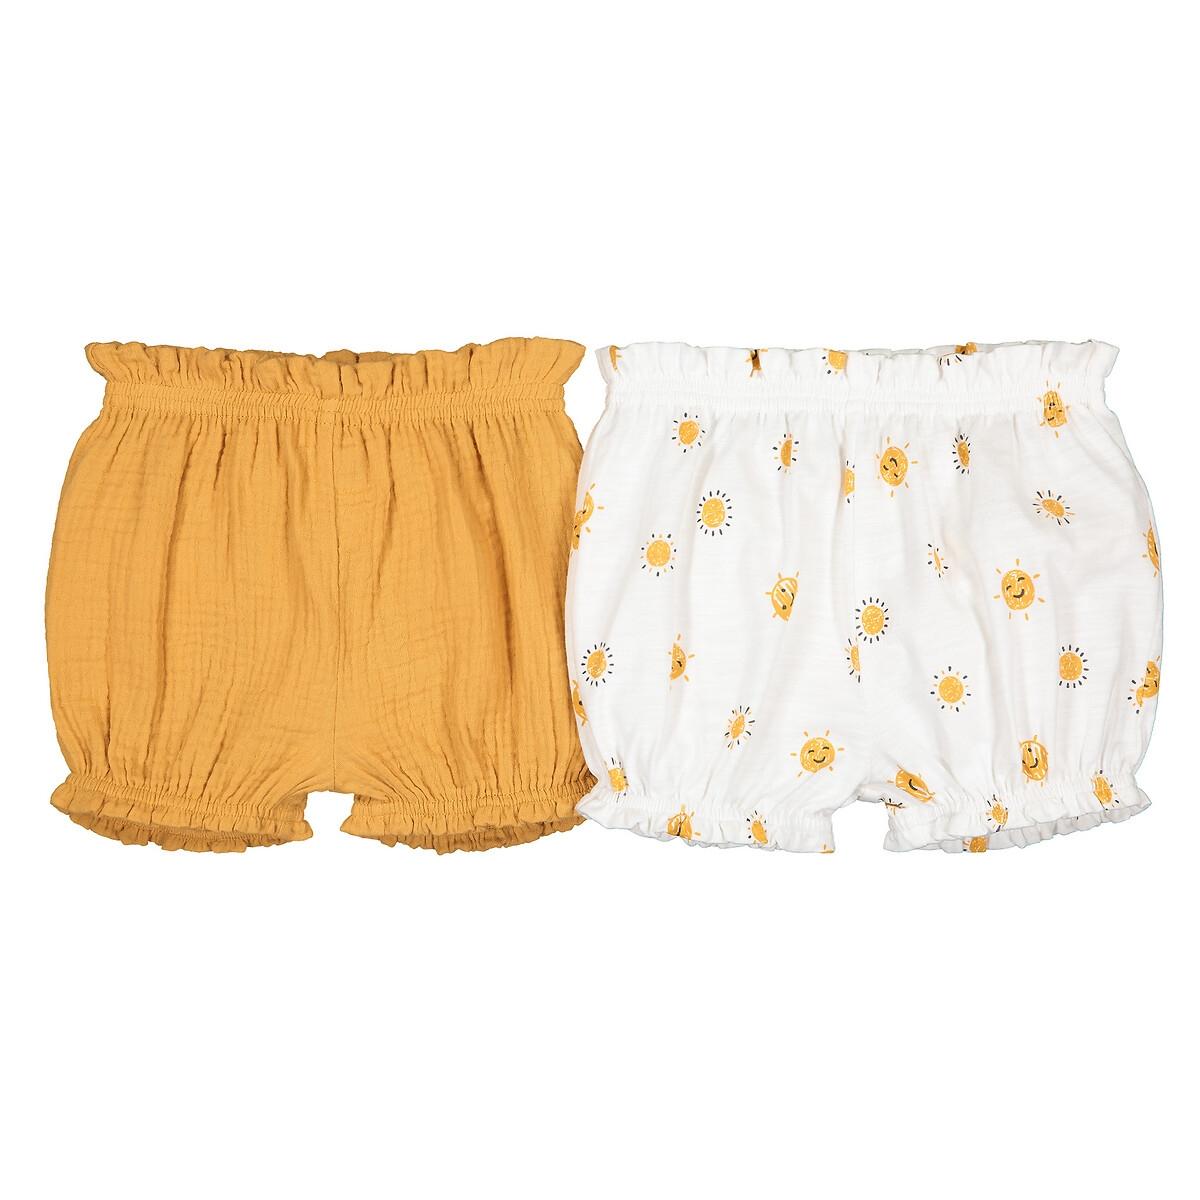 Фото - Комплект из 2 шортов 1 LaRedoute Мес - 3 года 9 мес. - 71 см желтый брюки laredoute из мольтона с бантом 1 мес 3 года 9 мес 71 см розовый